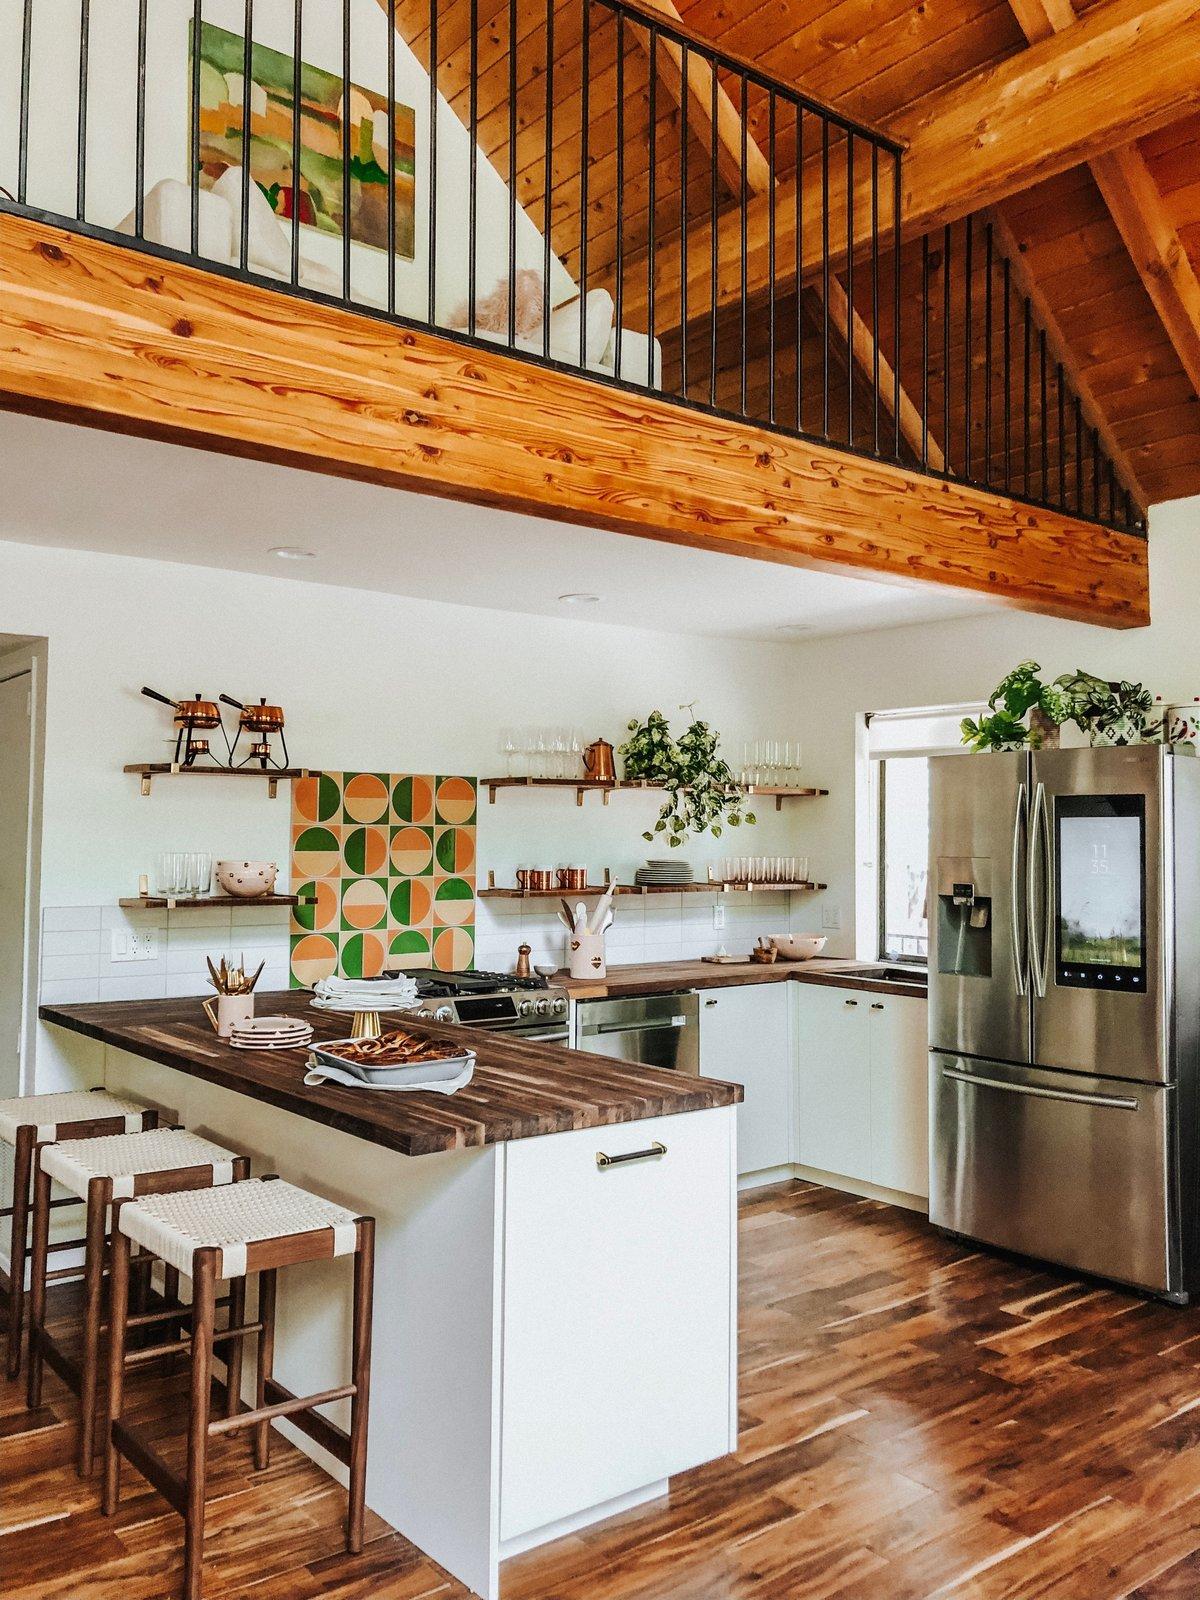 Kitchy Cabin kitchen